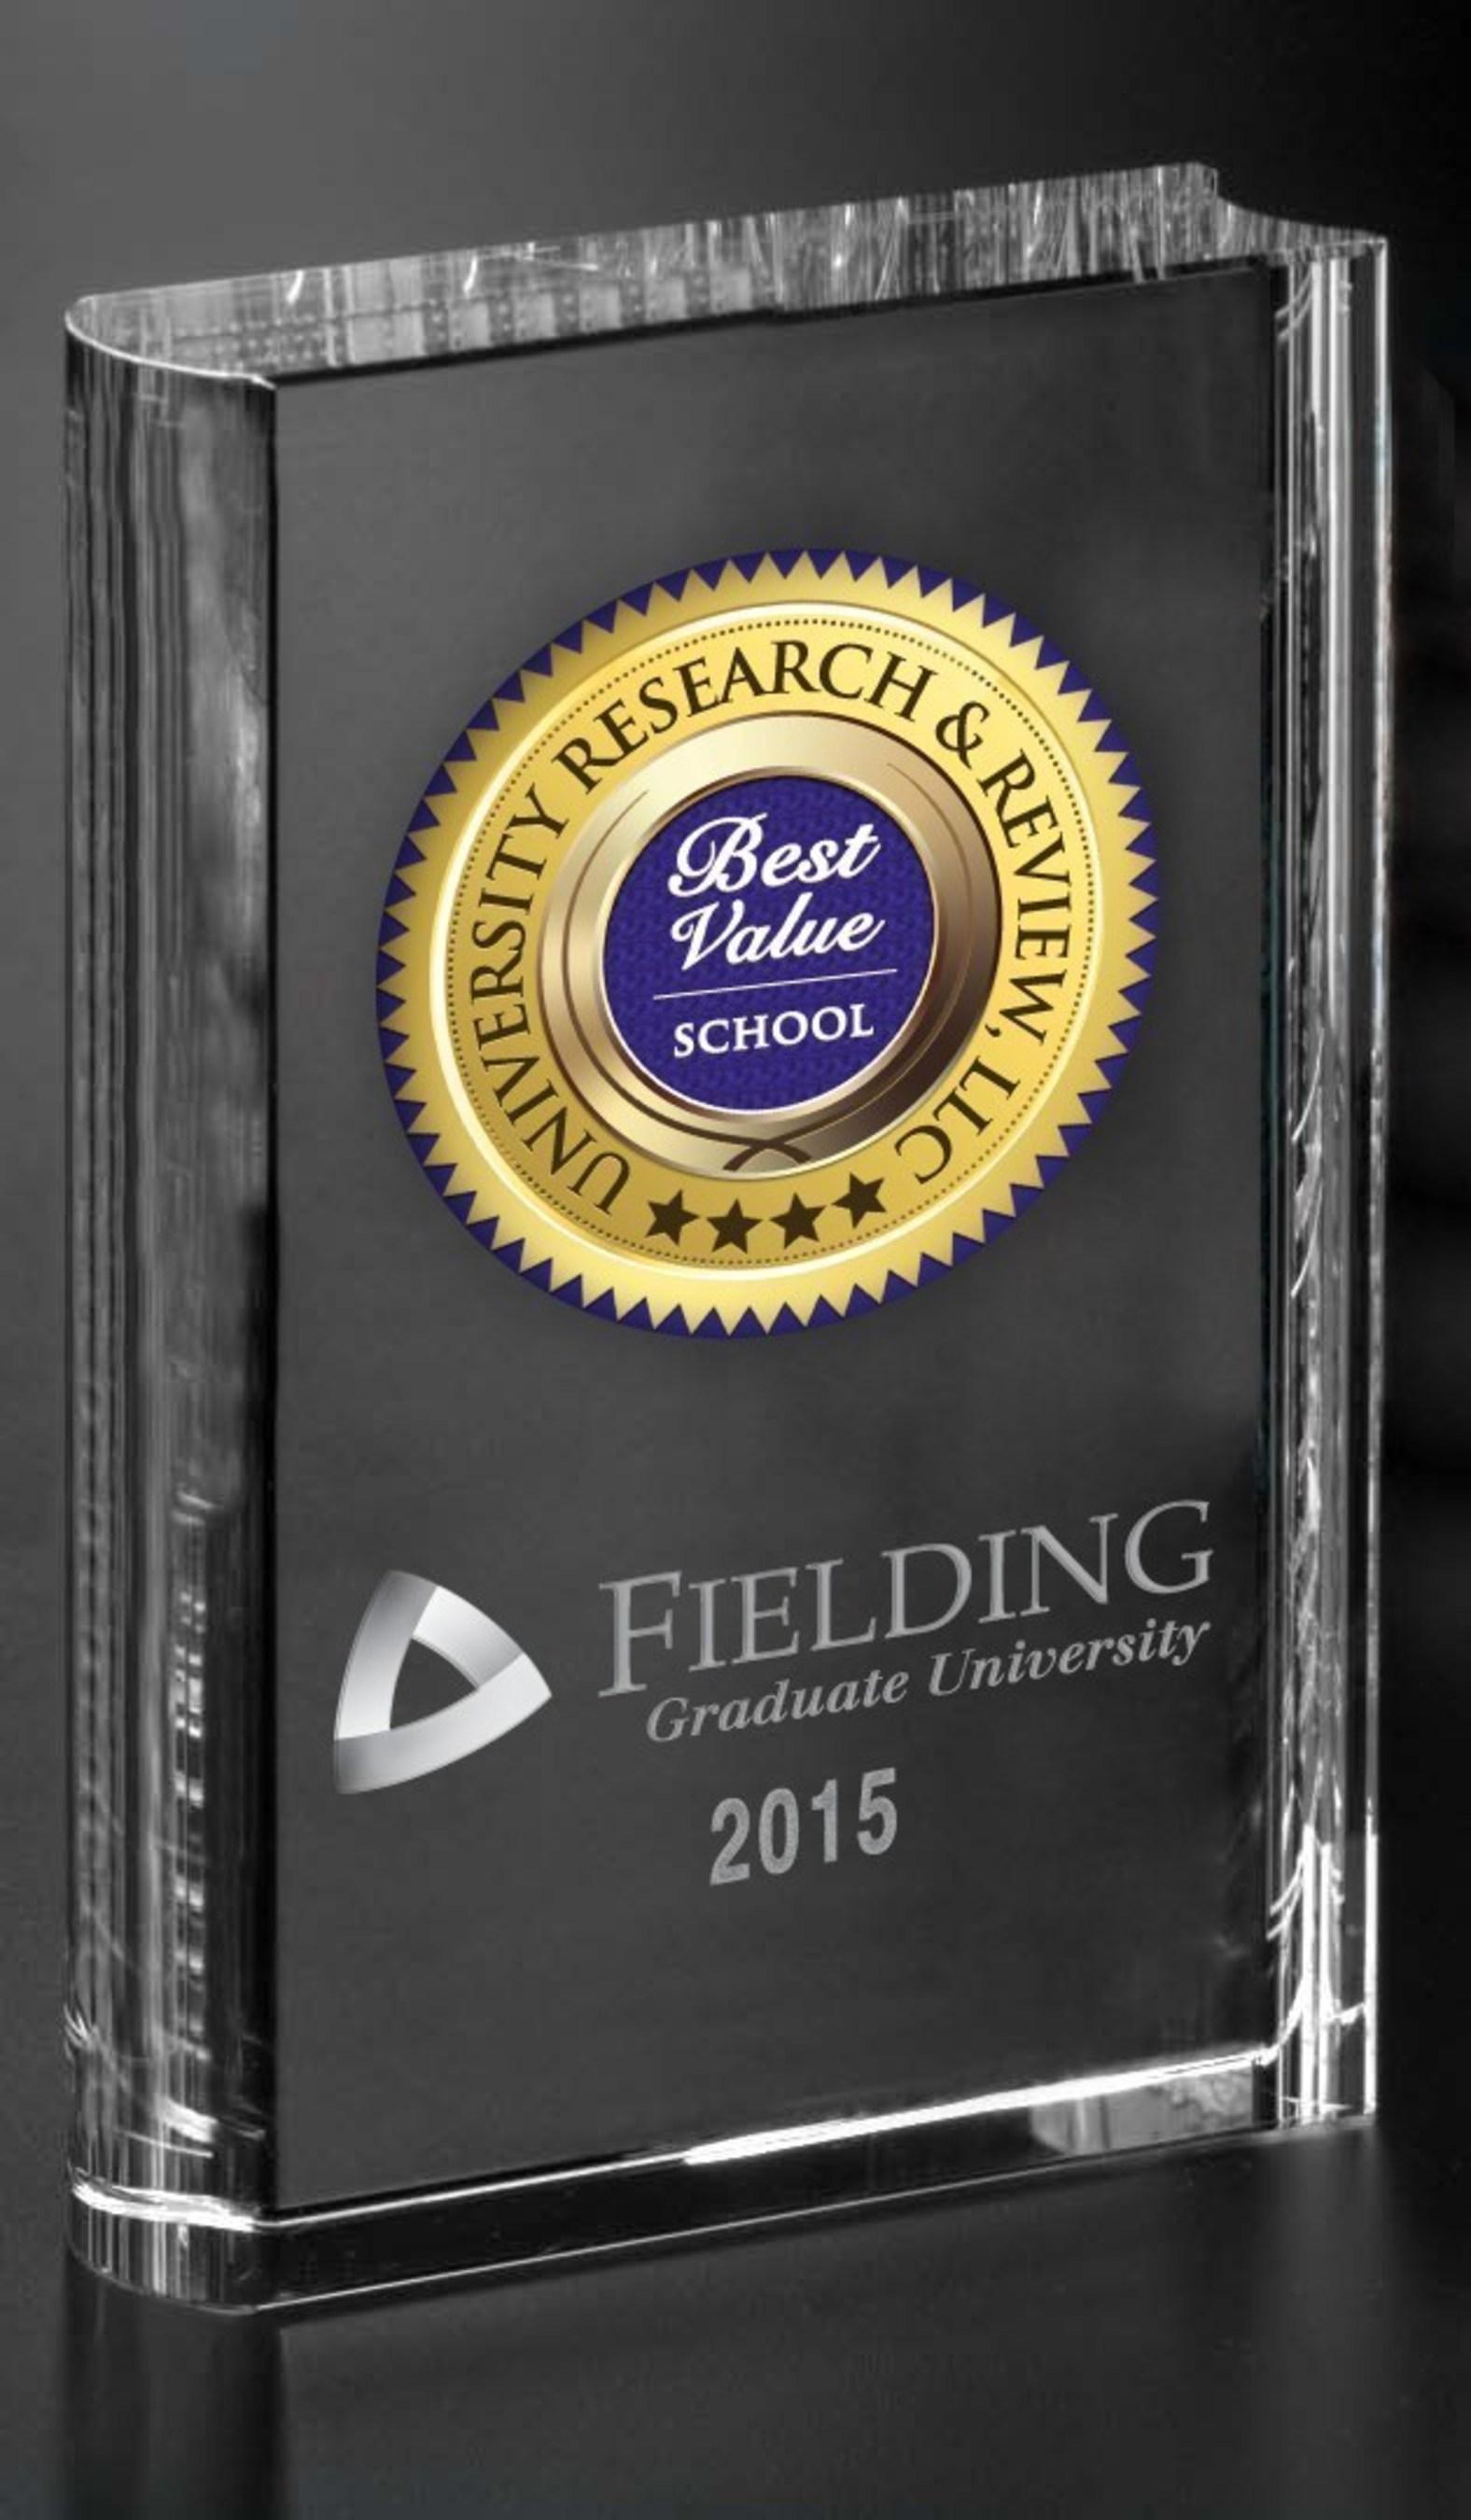 Fielding Graduate University Selected as a 2015 Best Value School Award Recipient